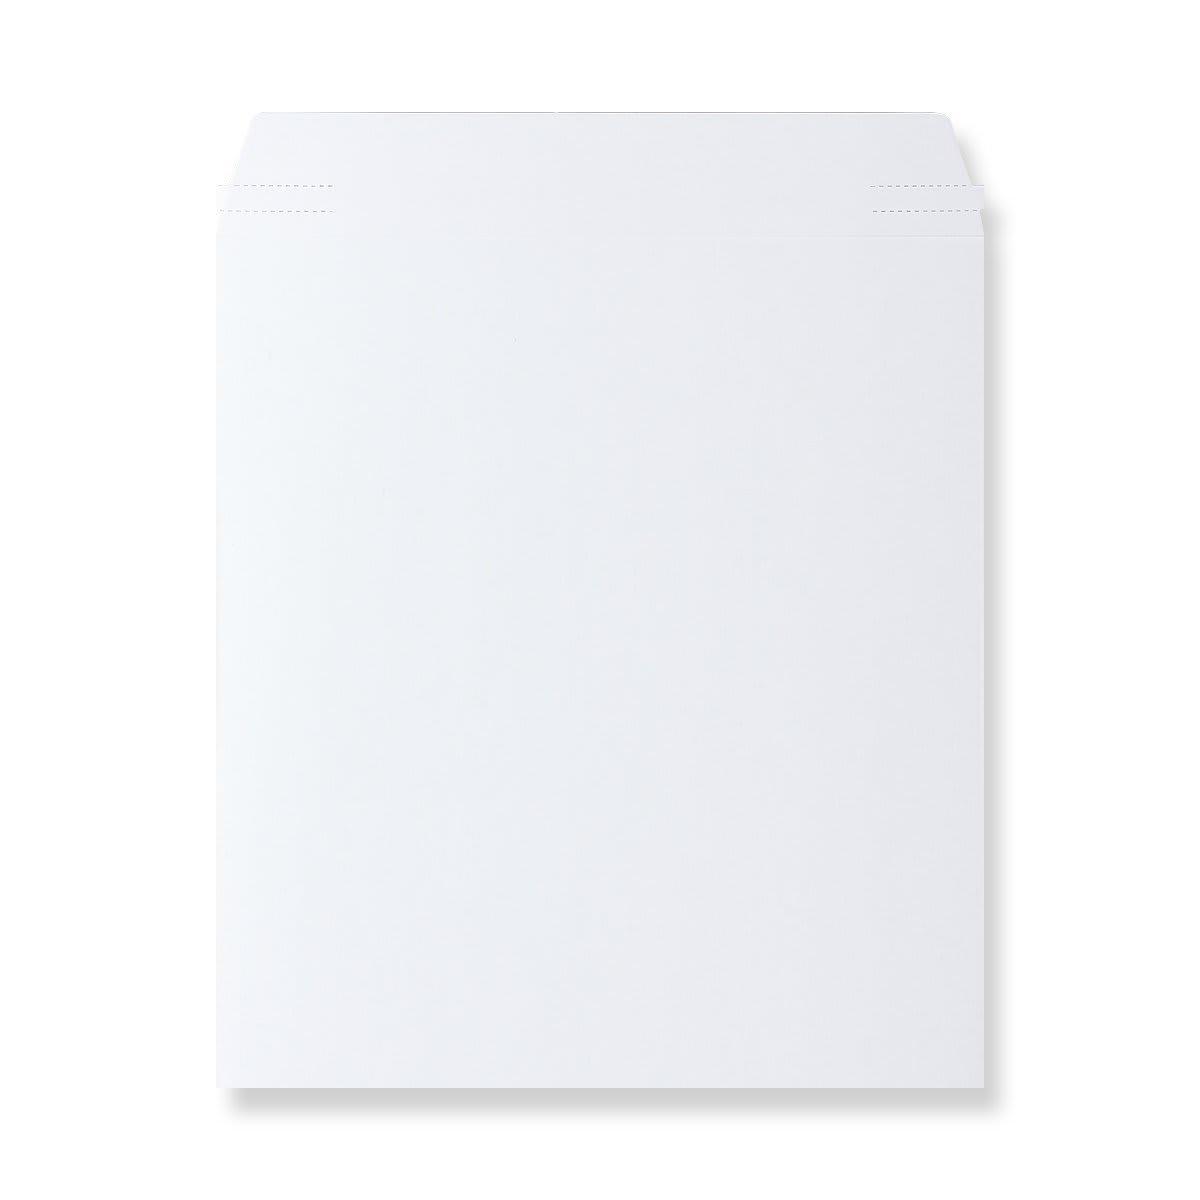 406 x 318mm WHITE ALL BOARD ENVELOPES